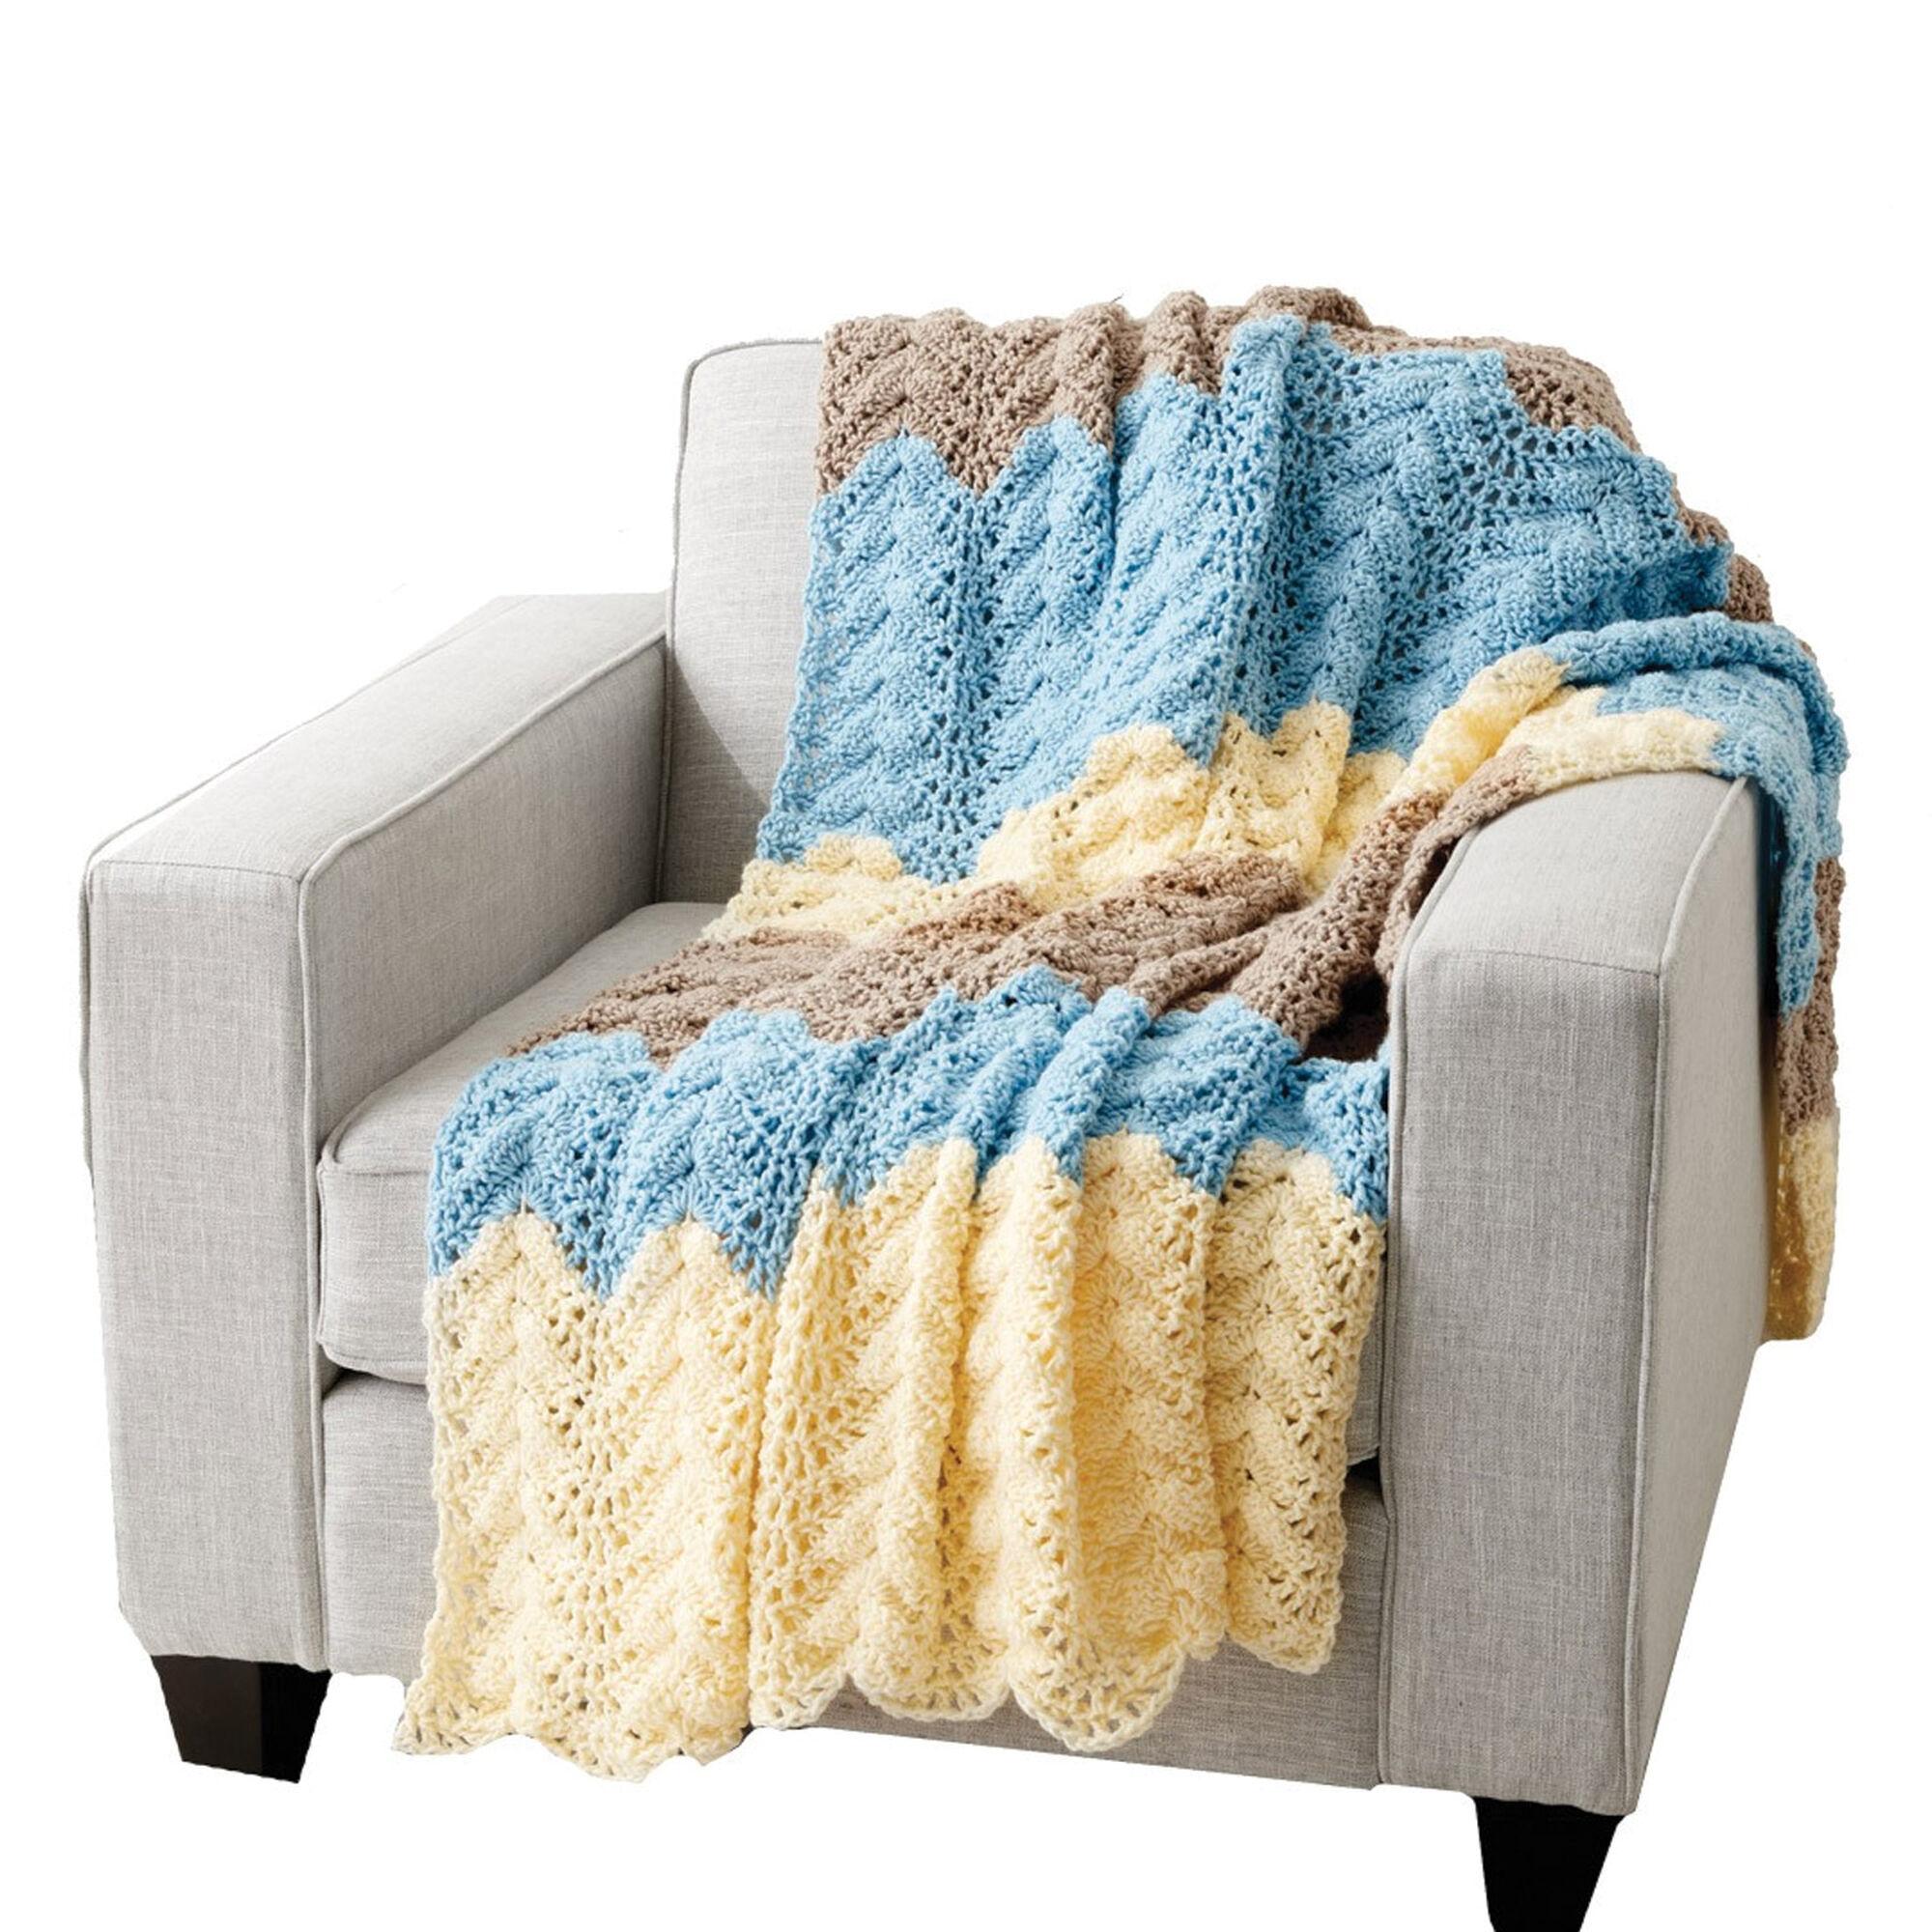 Caron Seaside Ripple Crochet Afghan | Yarnspirations